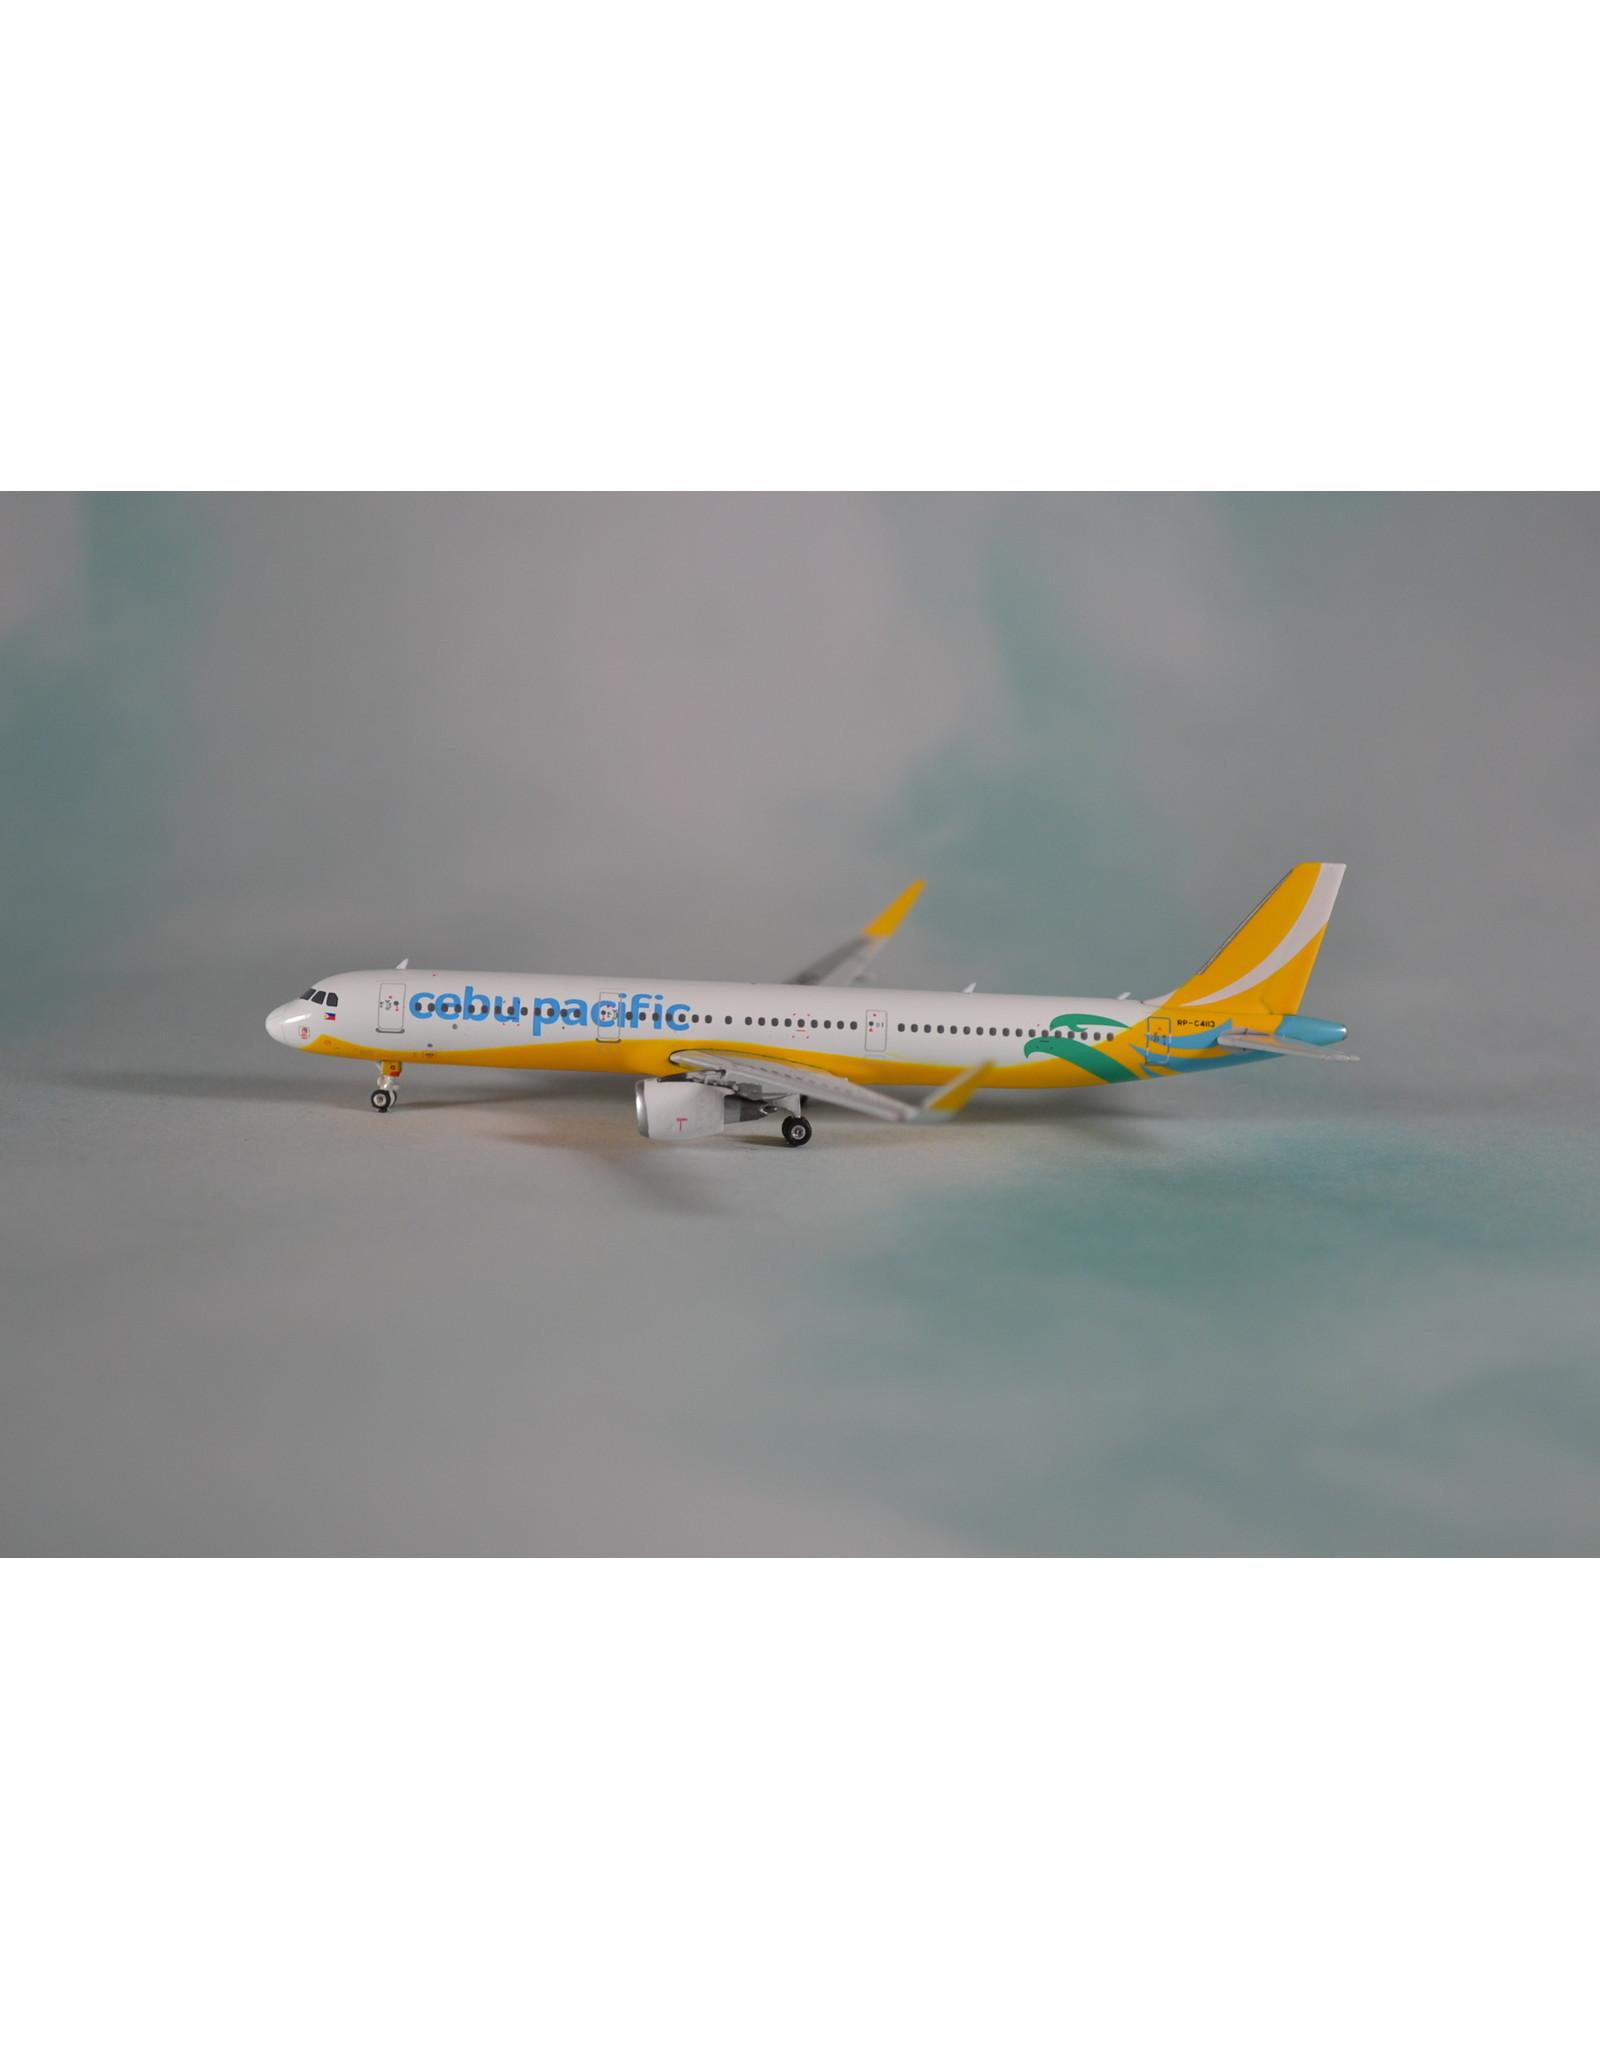 PH4 Cebu Pacific A321 RP-C4113